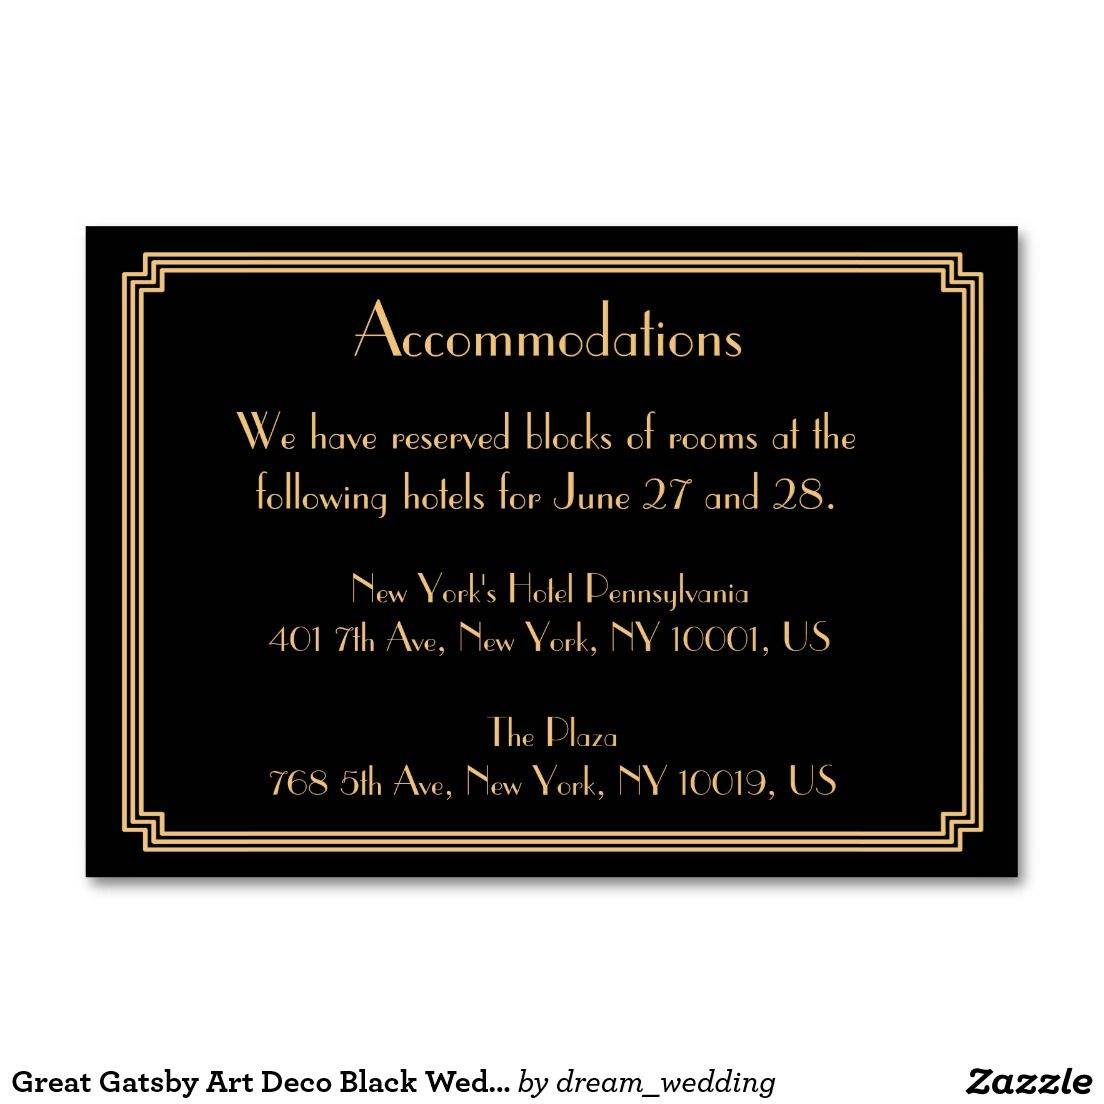 Great Gatsby Art Deco Black Wedding Accommodation Card